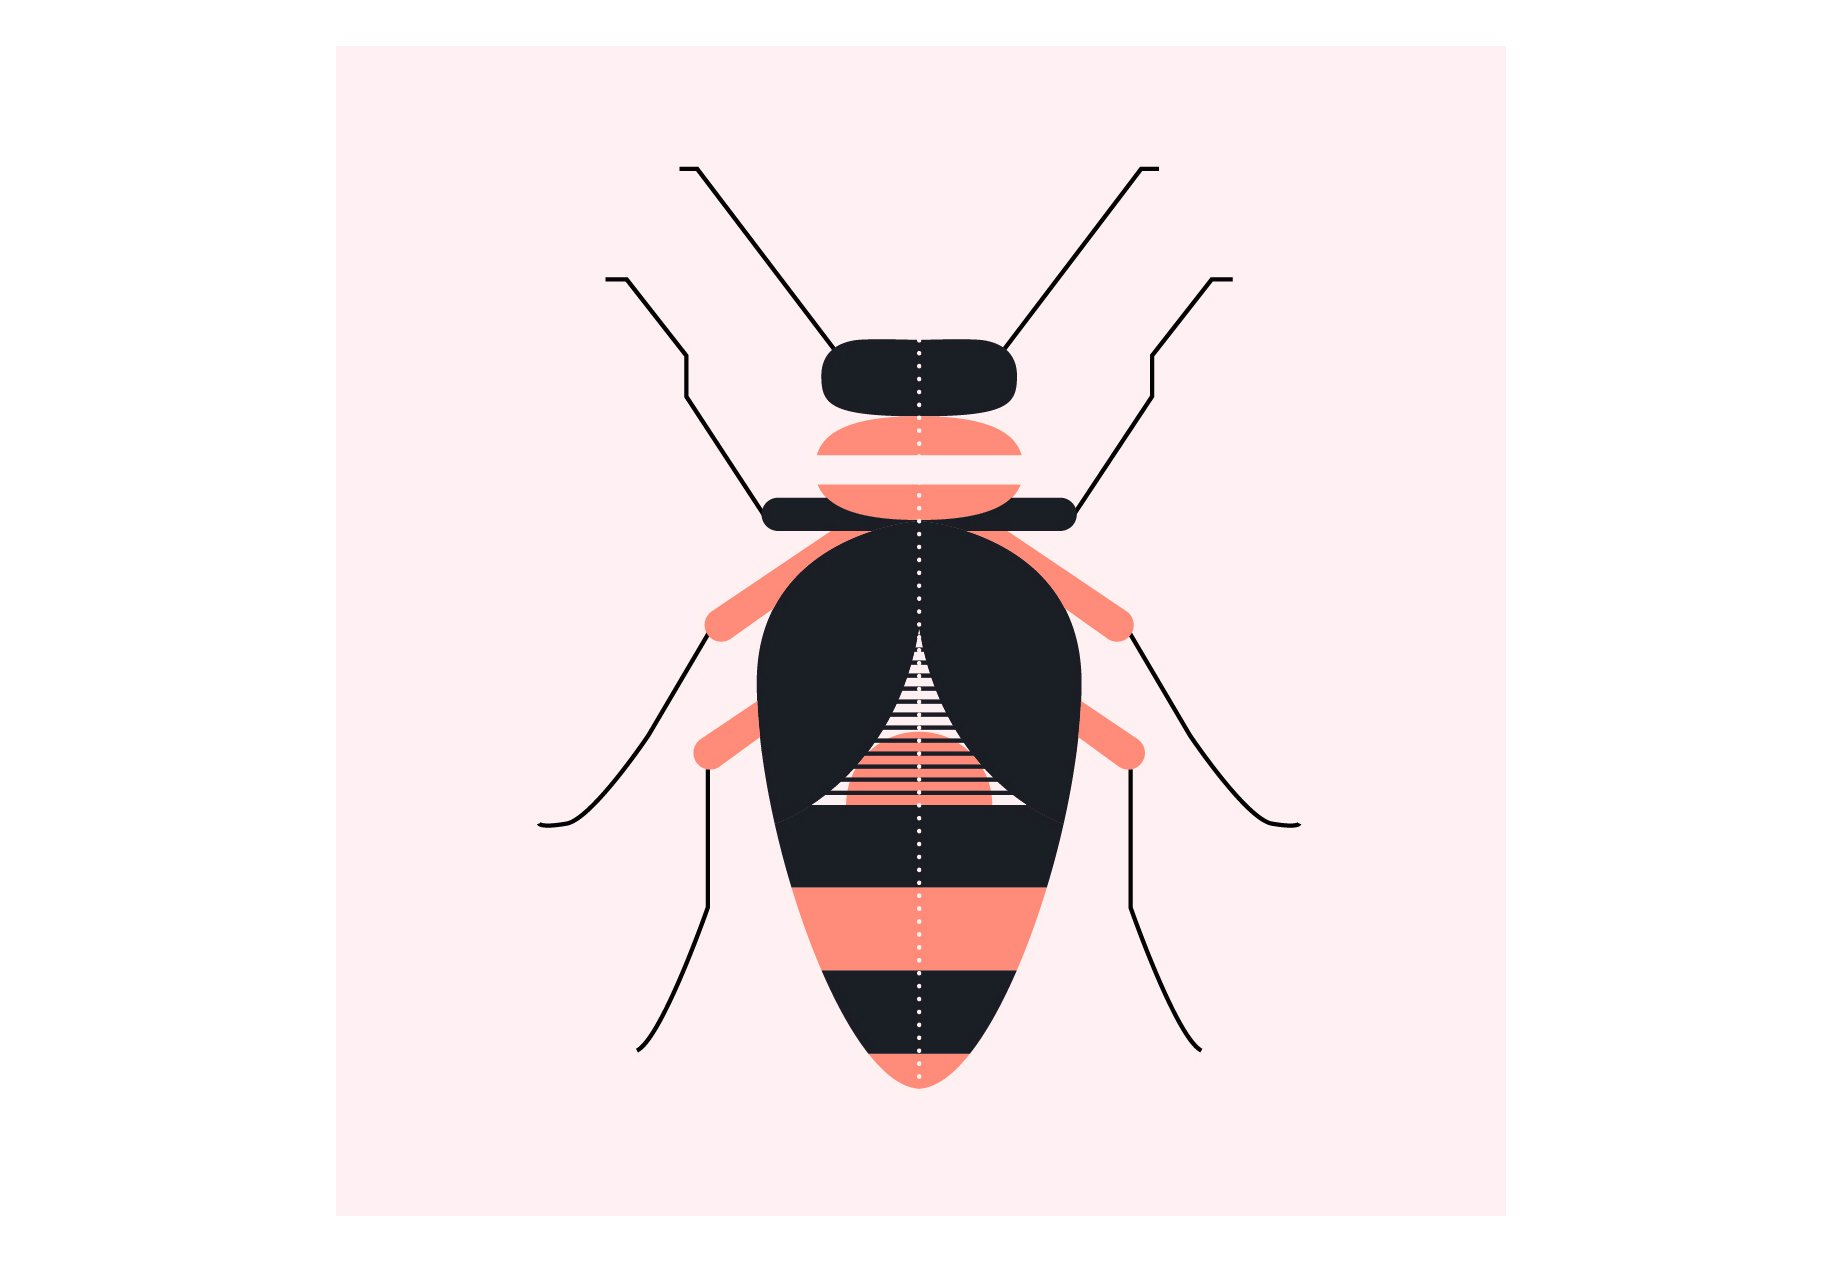 insects-illustration-02-alice-iuri